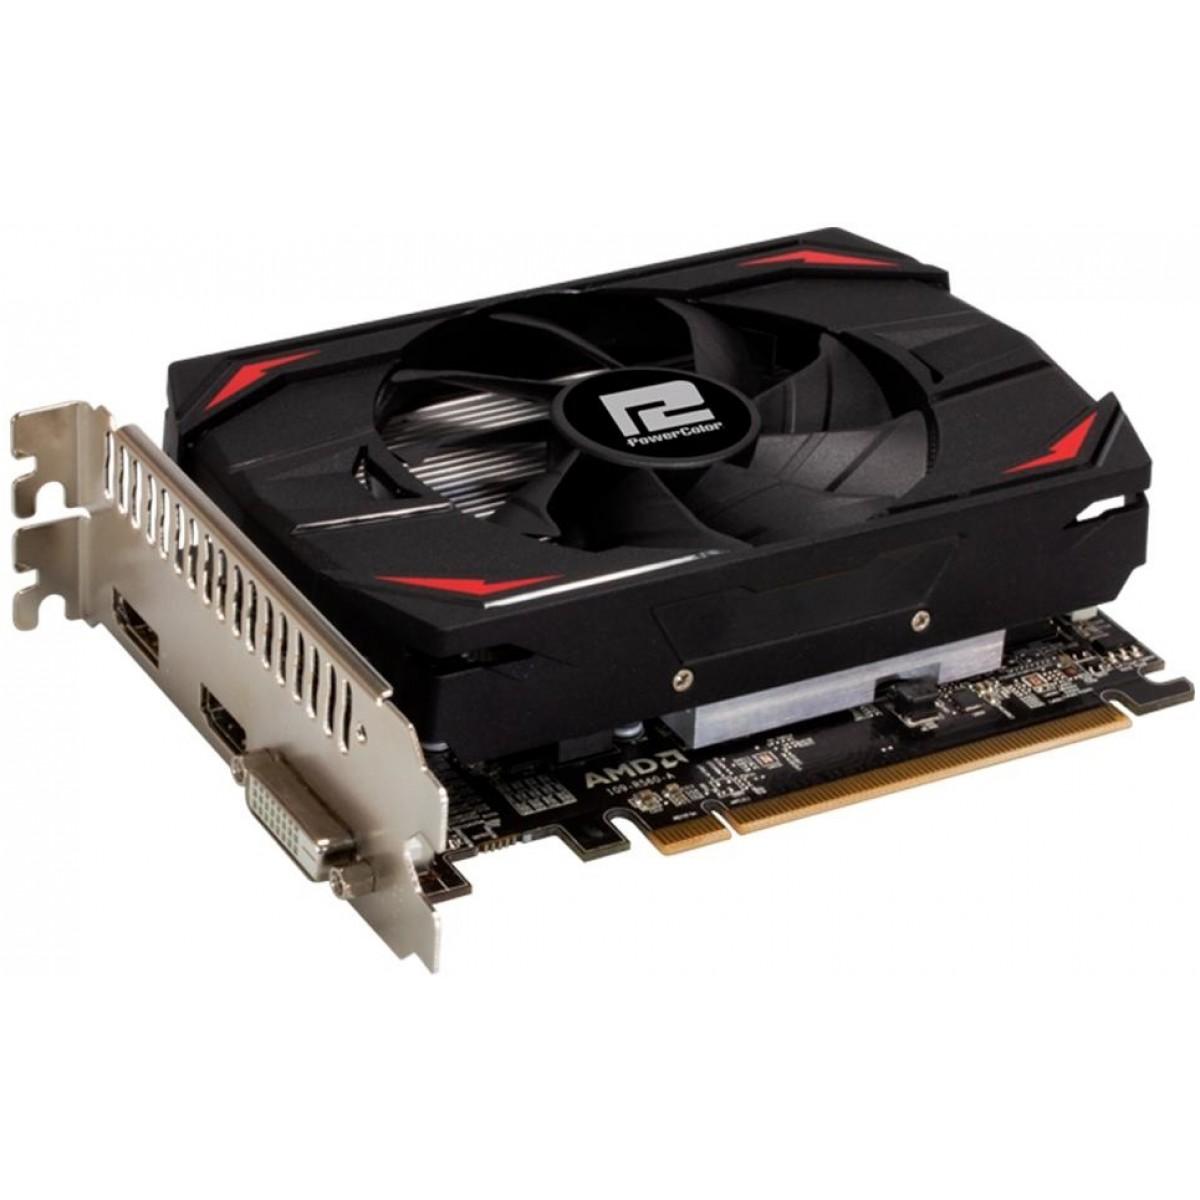 Placa de Vídeo PowerColor, Radeon, RX 550 Red Dragon, 4GB, DDR5, 128Bit, AXRX 550 4GBD5-DH